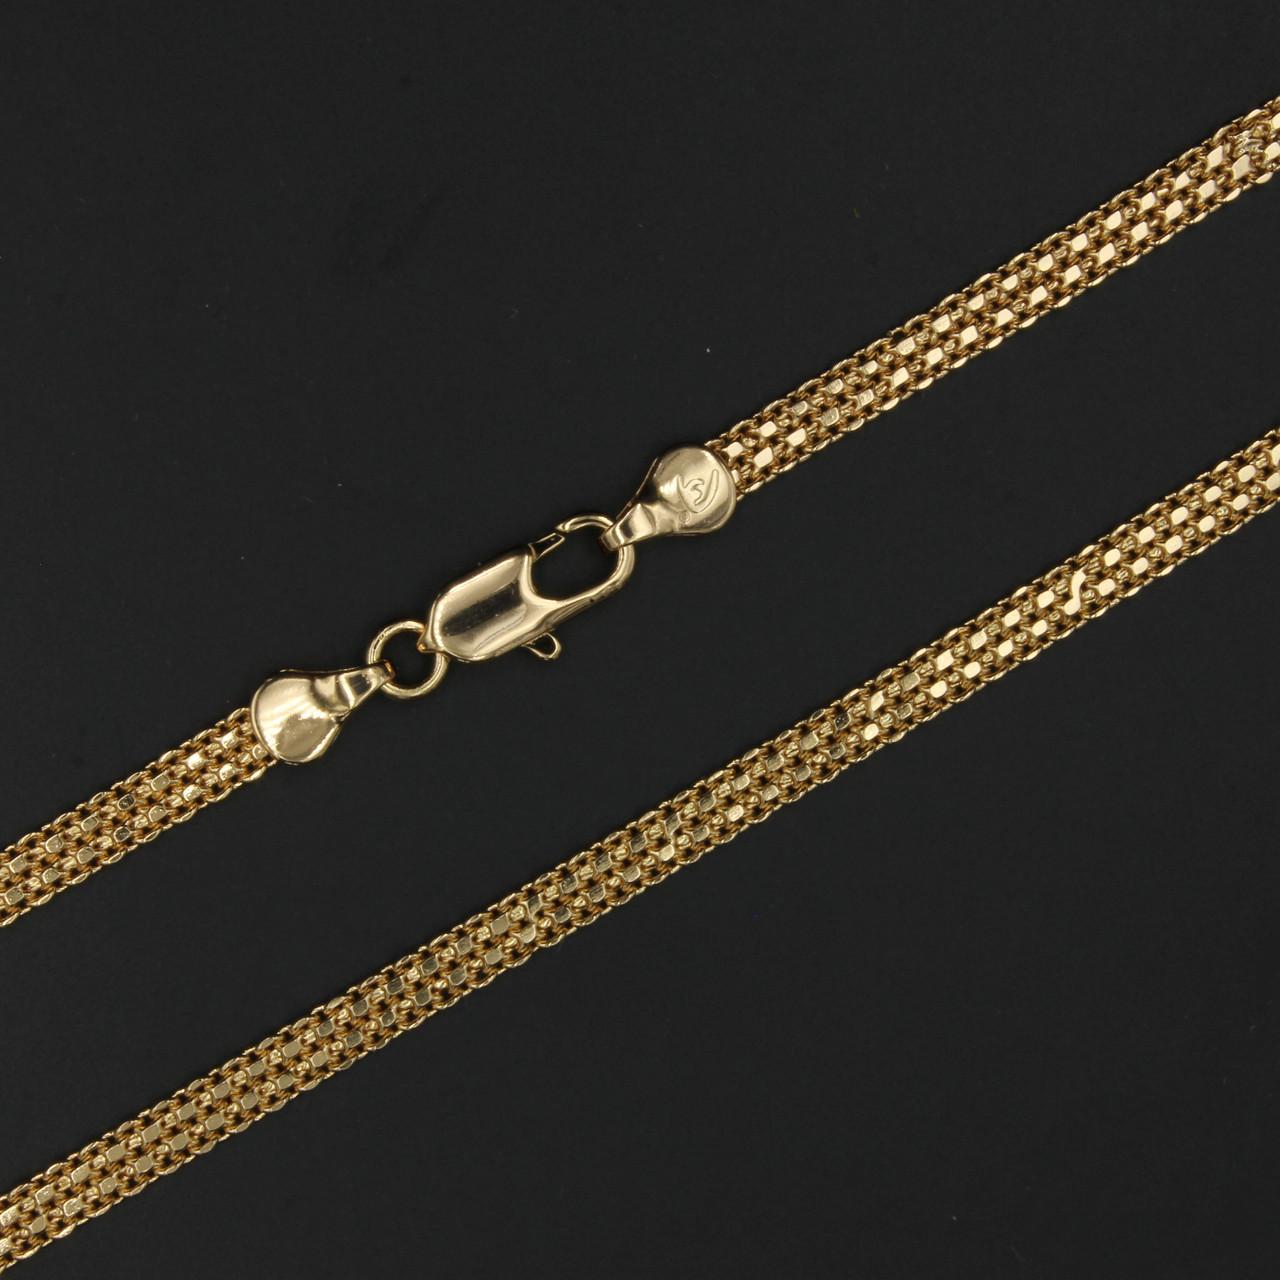 Ланцюг Бісмарк, плетення бісмарк, 60см